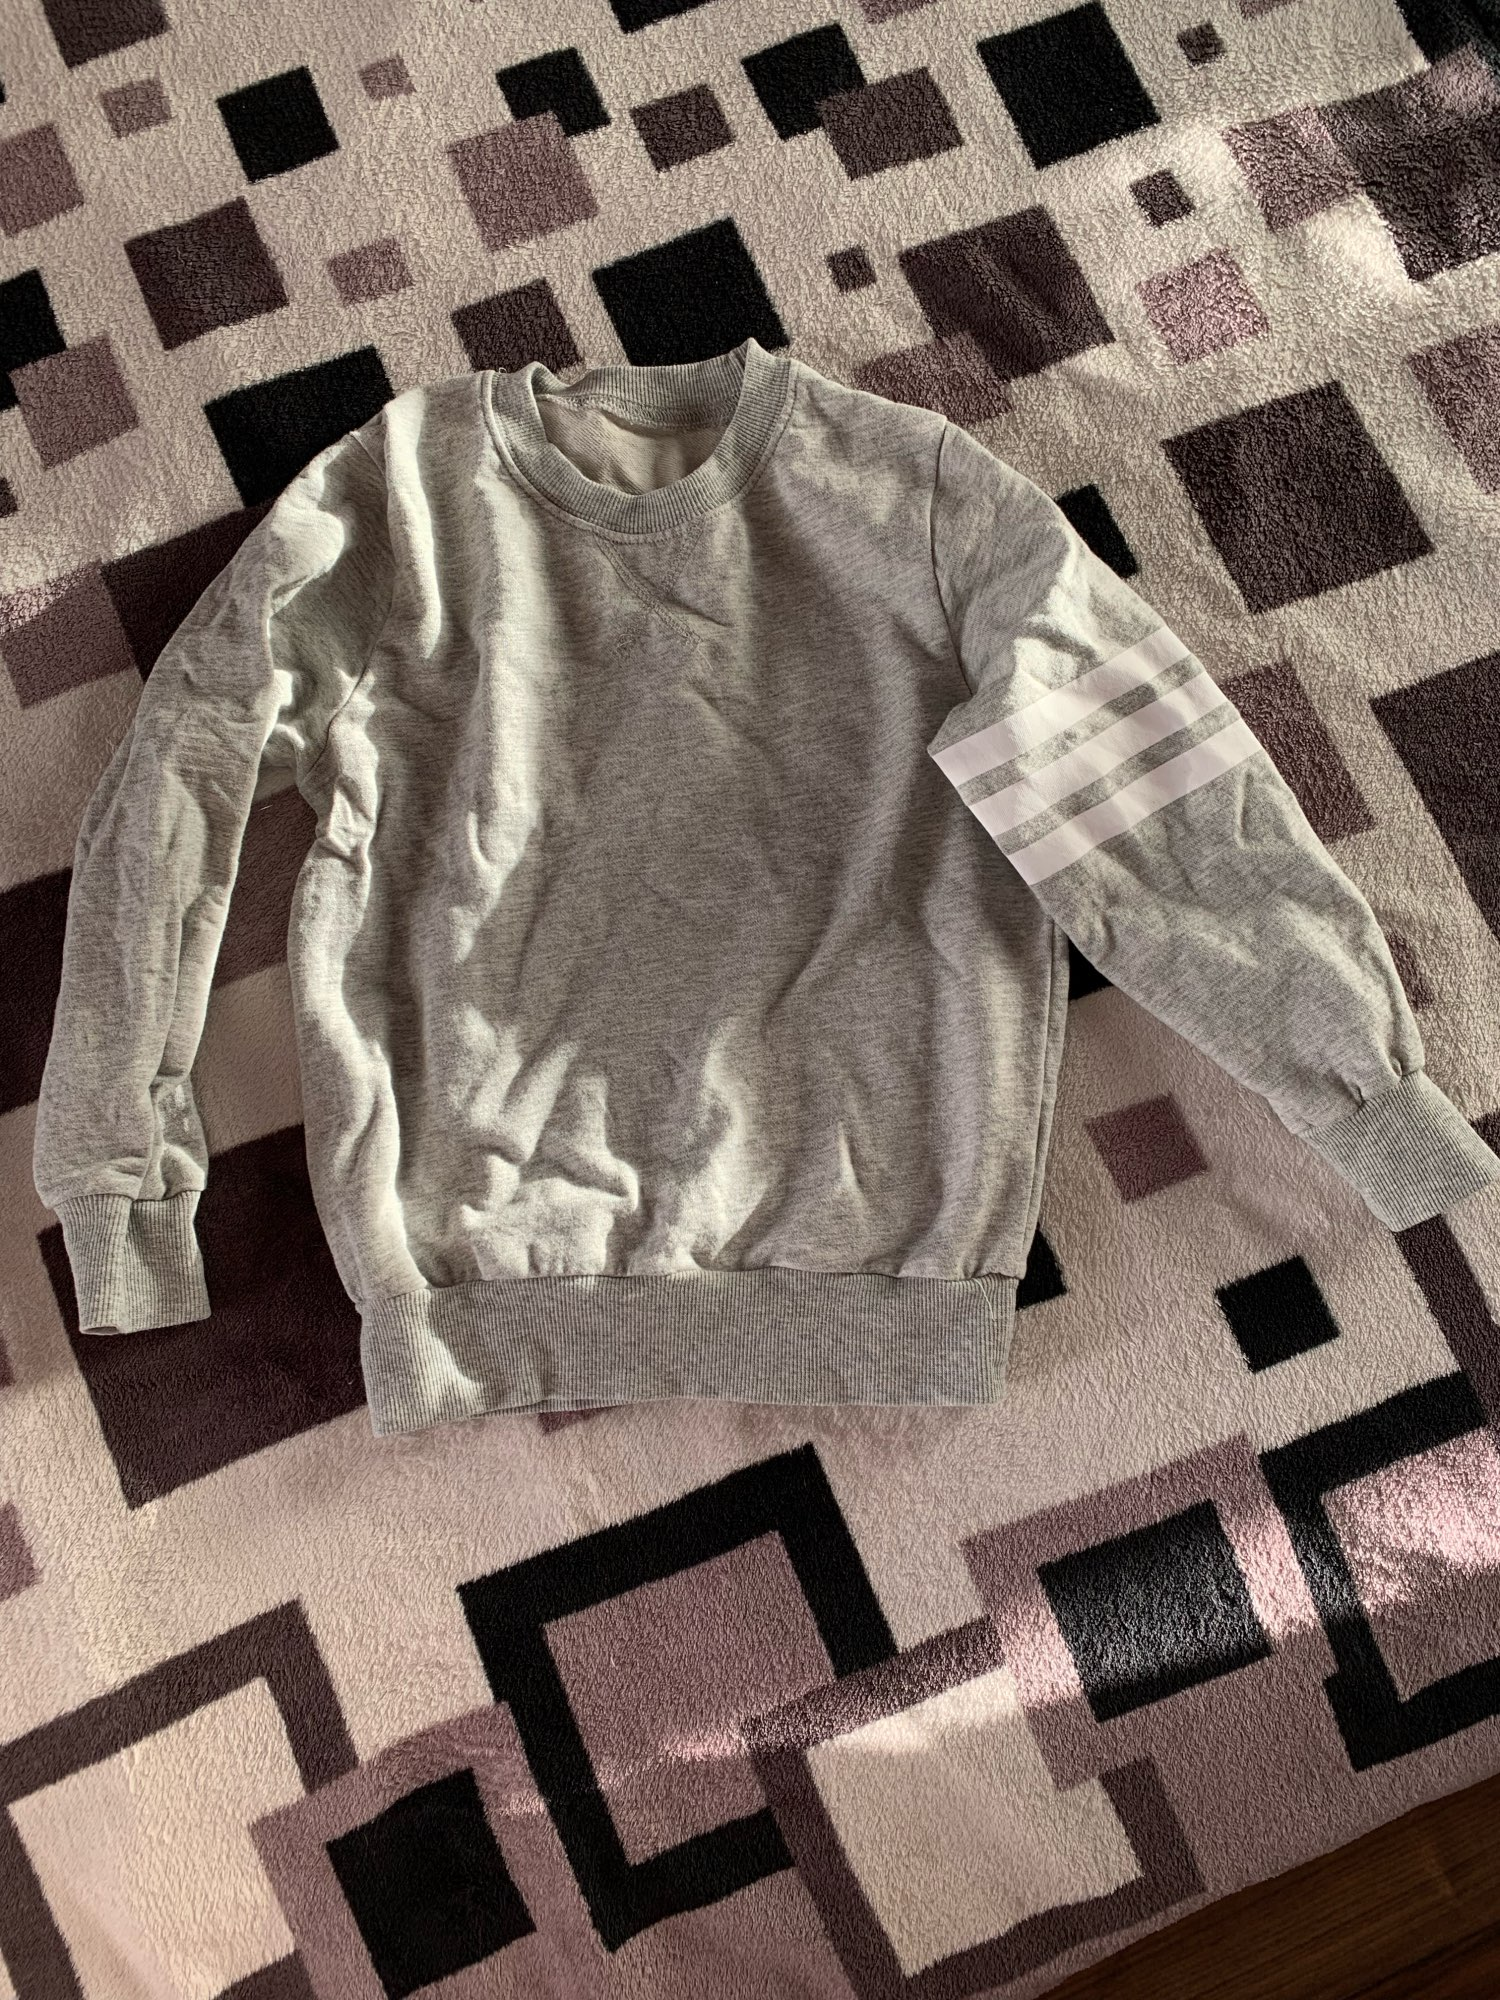 Autumn Winter Kids Long Sleeve T Shirts Cartoon Boys Sweatshirts Outwear Baby Tees Top Children Clothing 2-10Y photo review